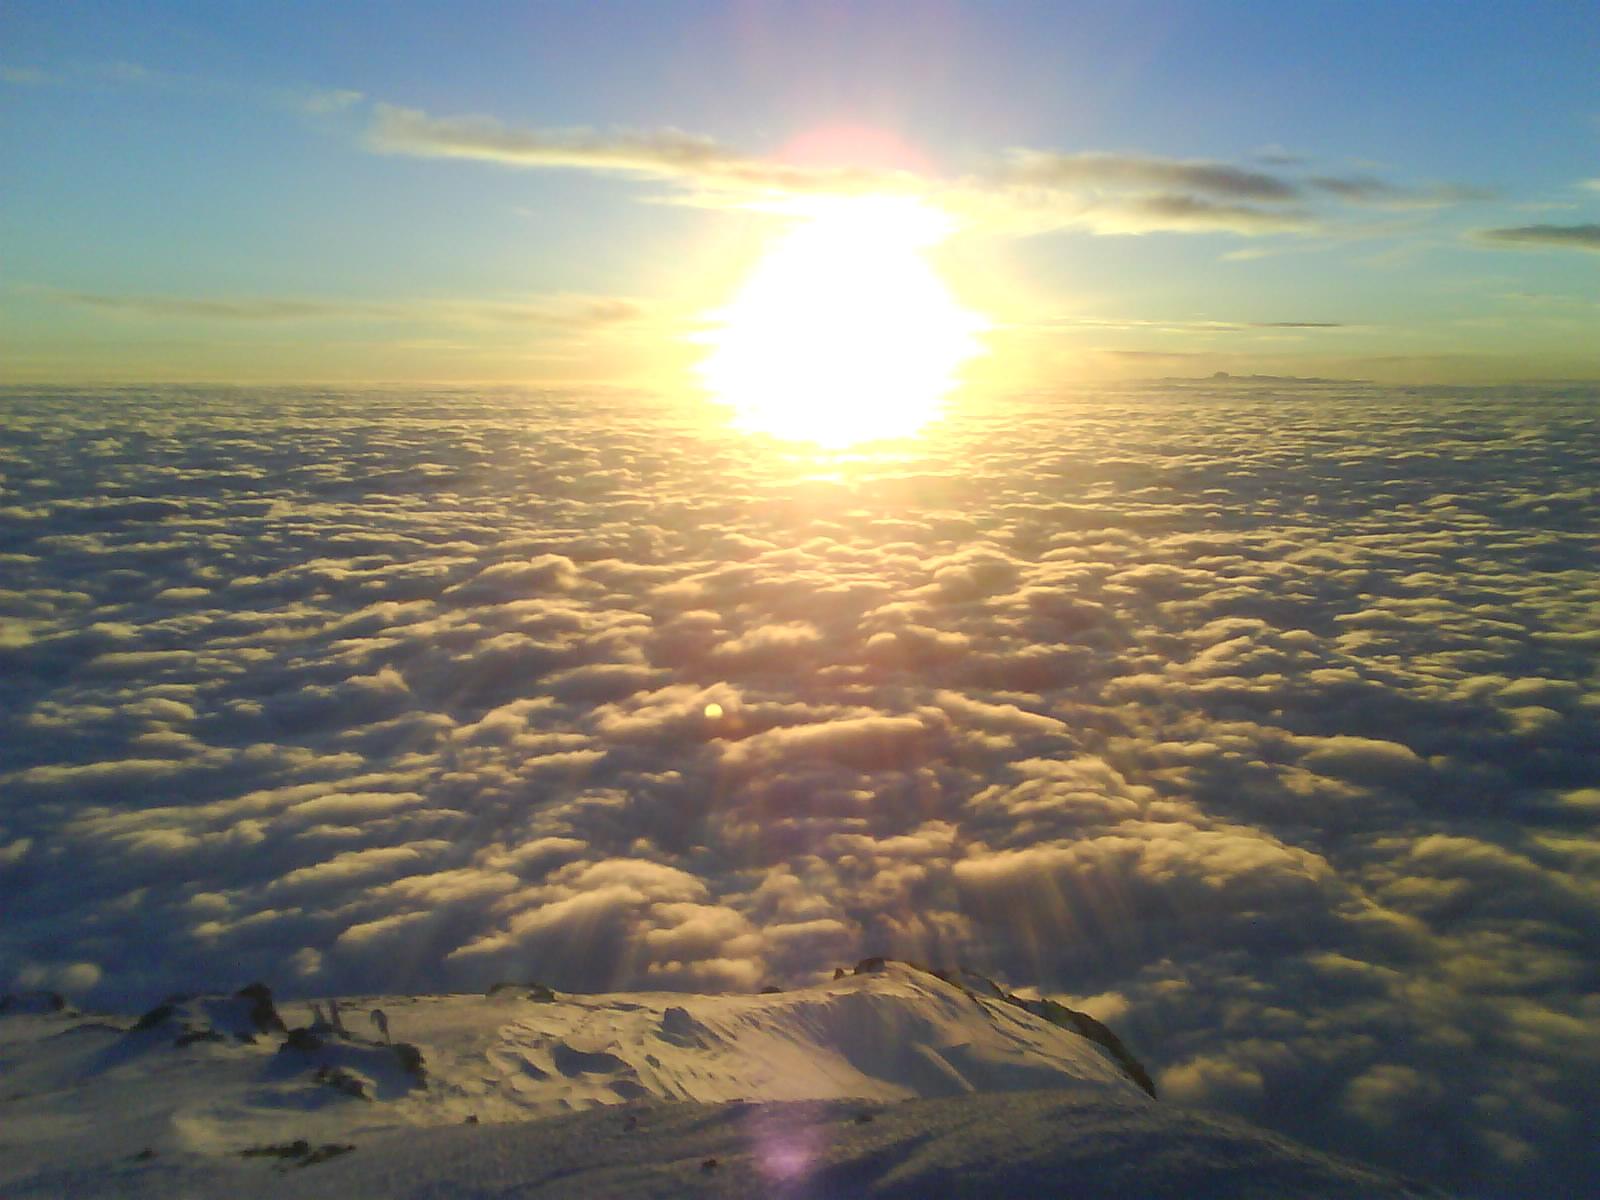 عکس1:«خورشید برفراز ابرها»